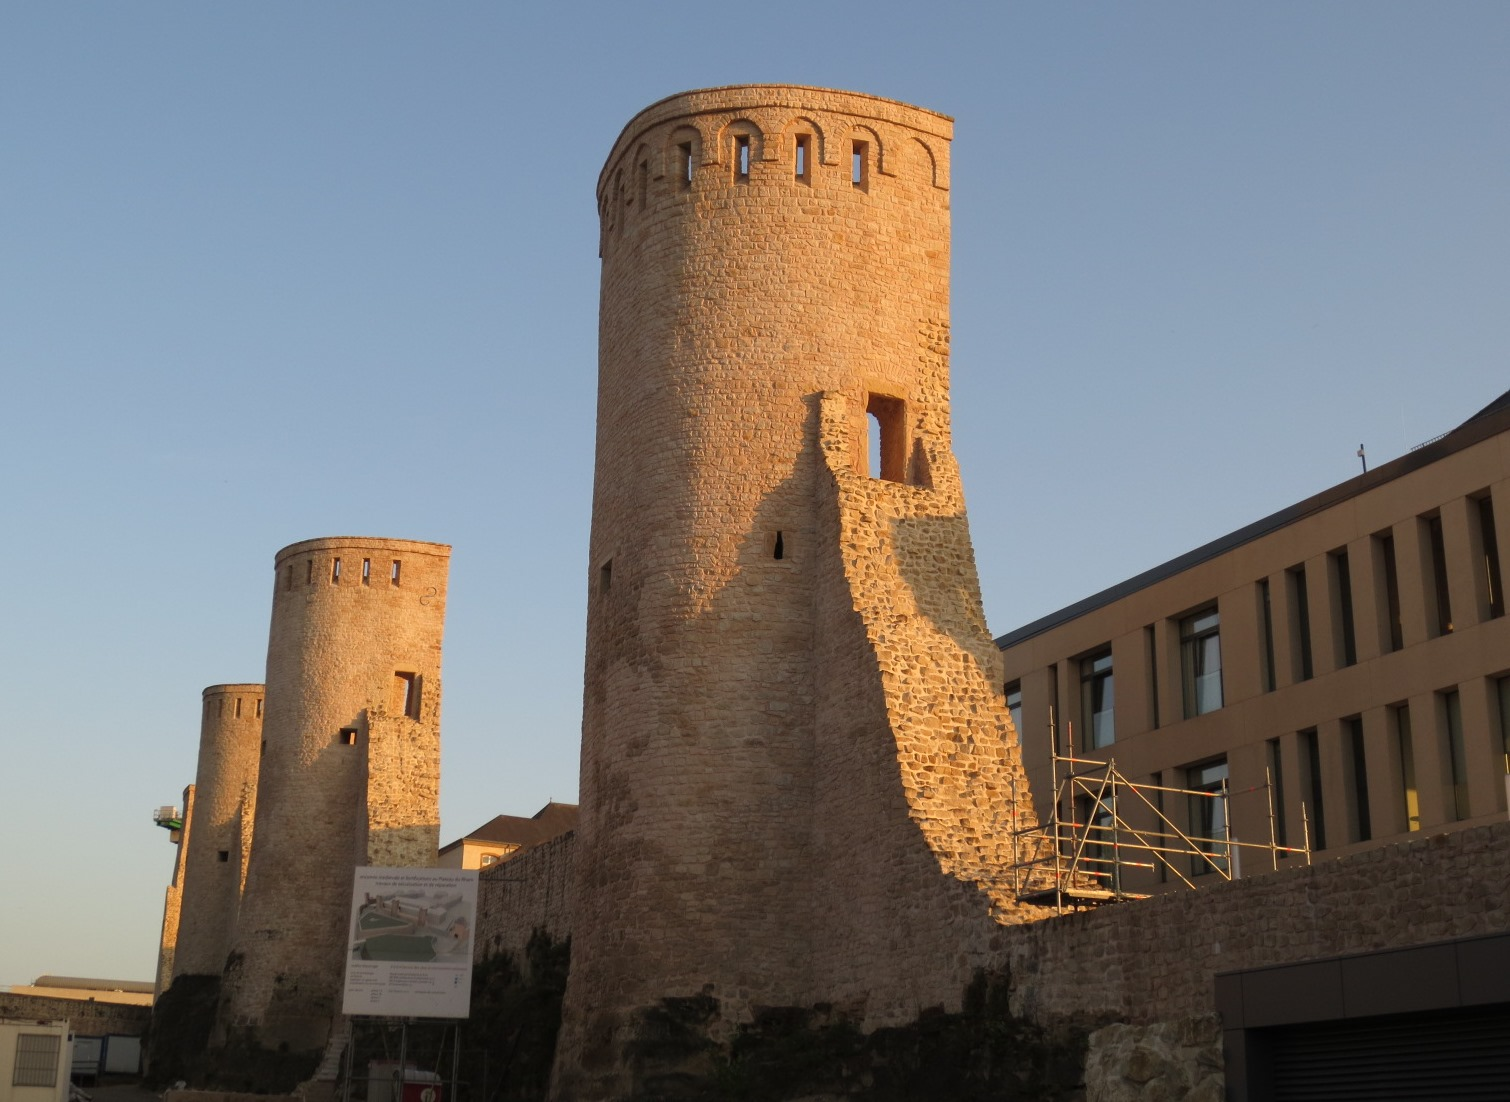 luxemburg-europe-travelgrip- (12) - Copy